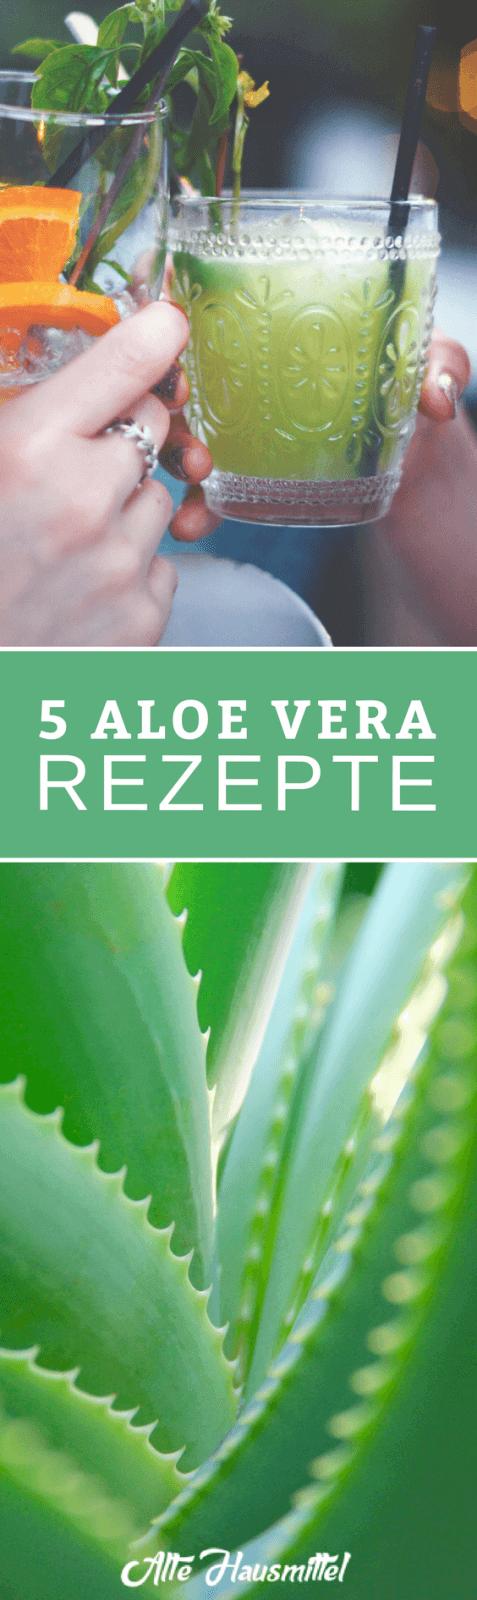 5 Aloe Vera Rezepte